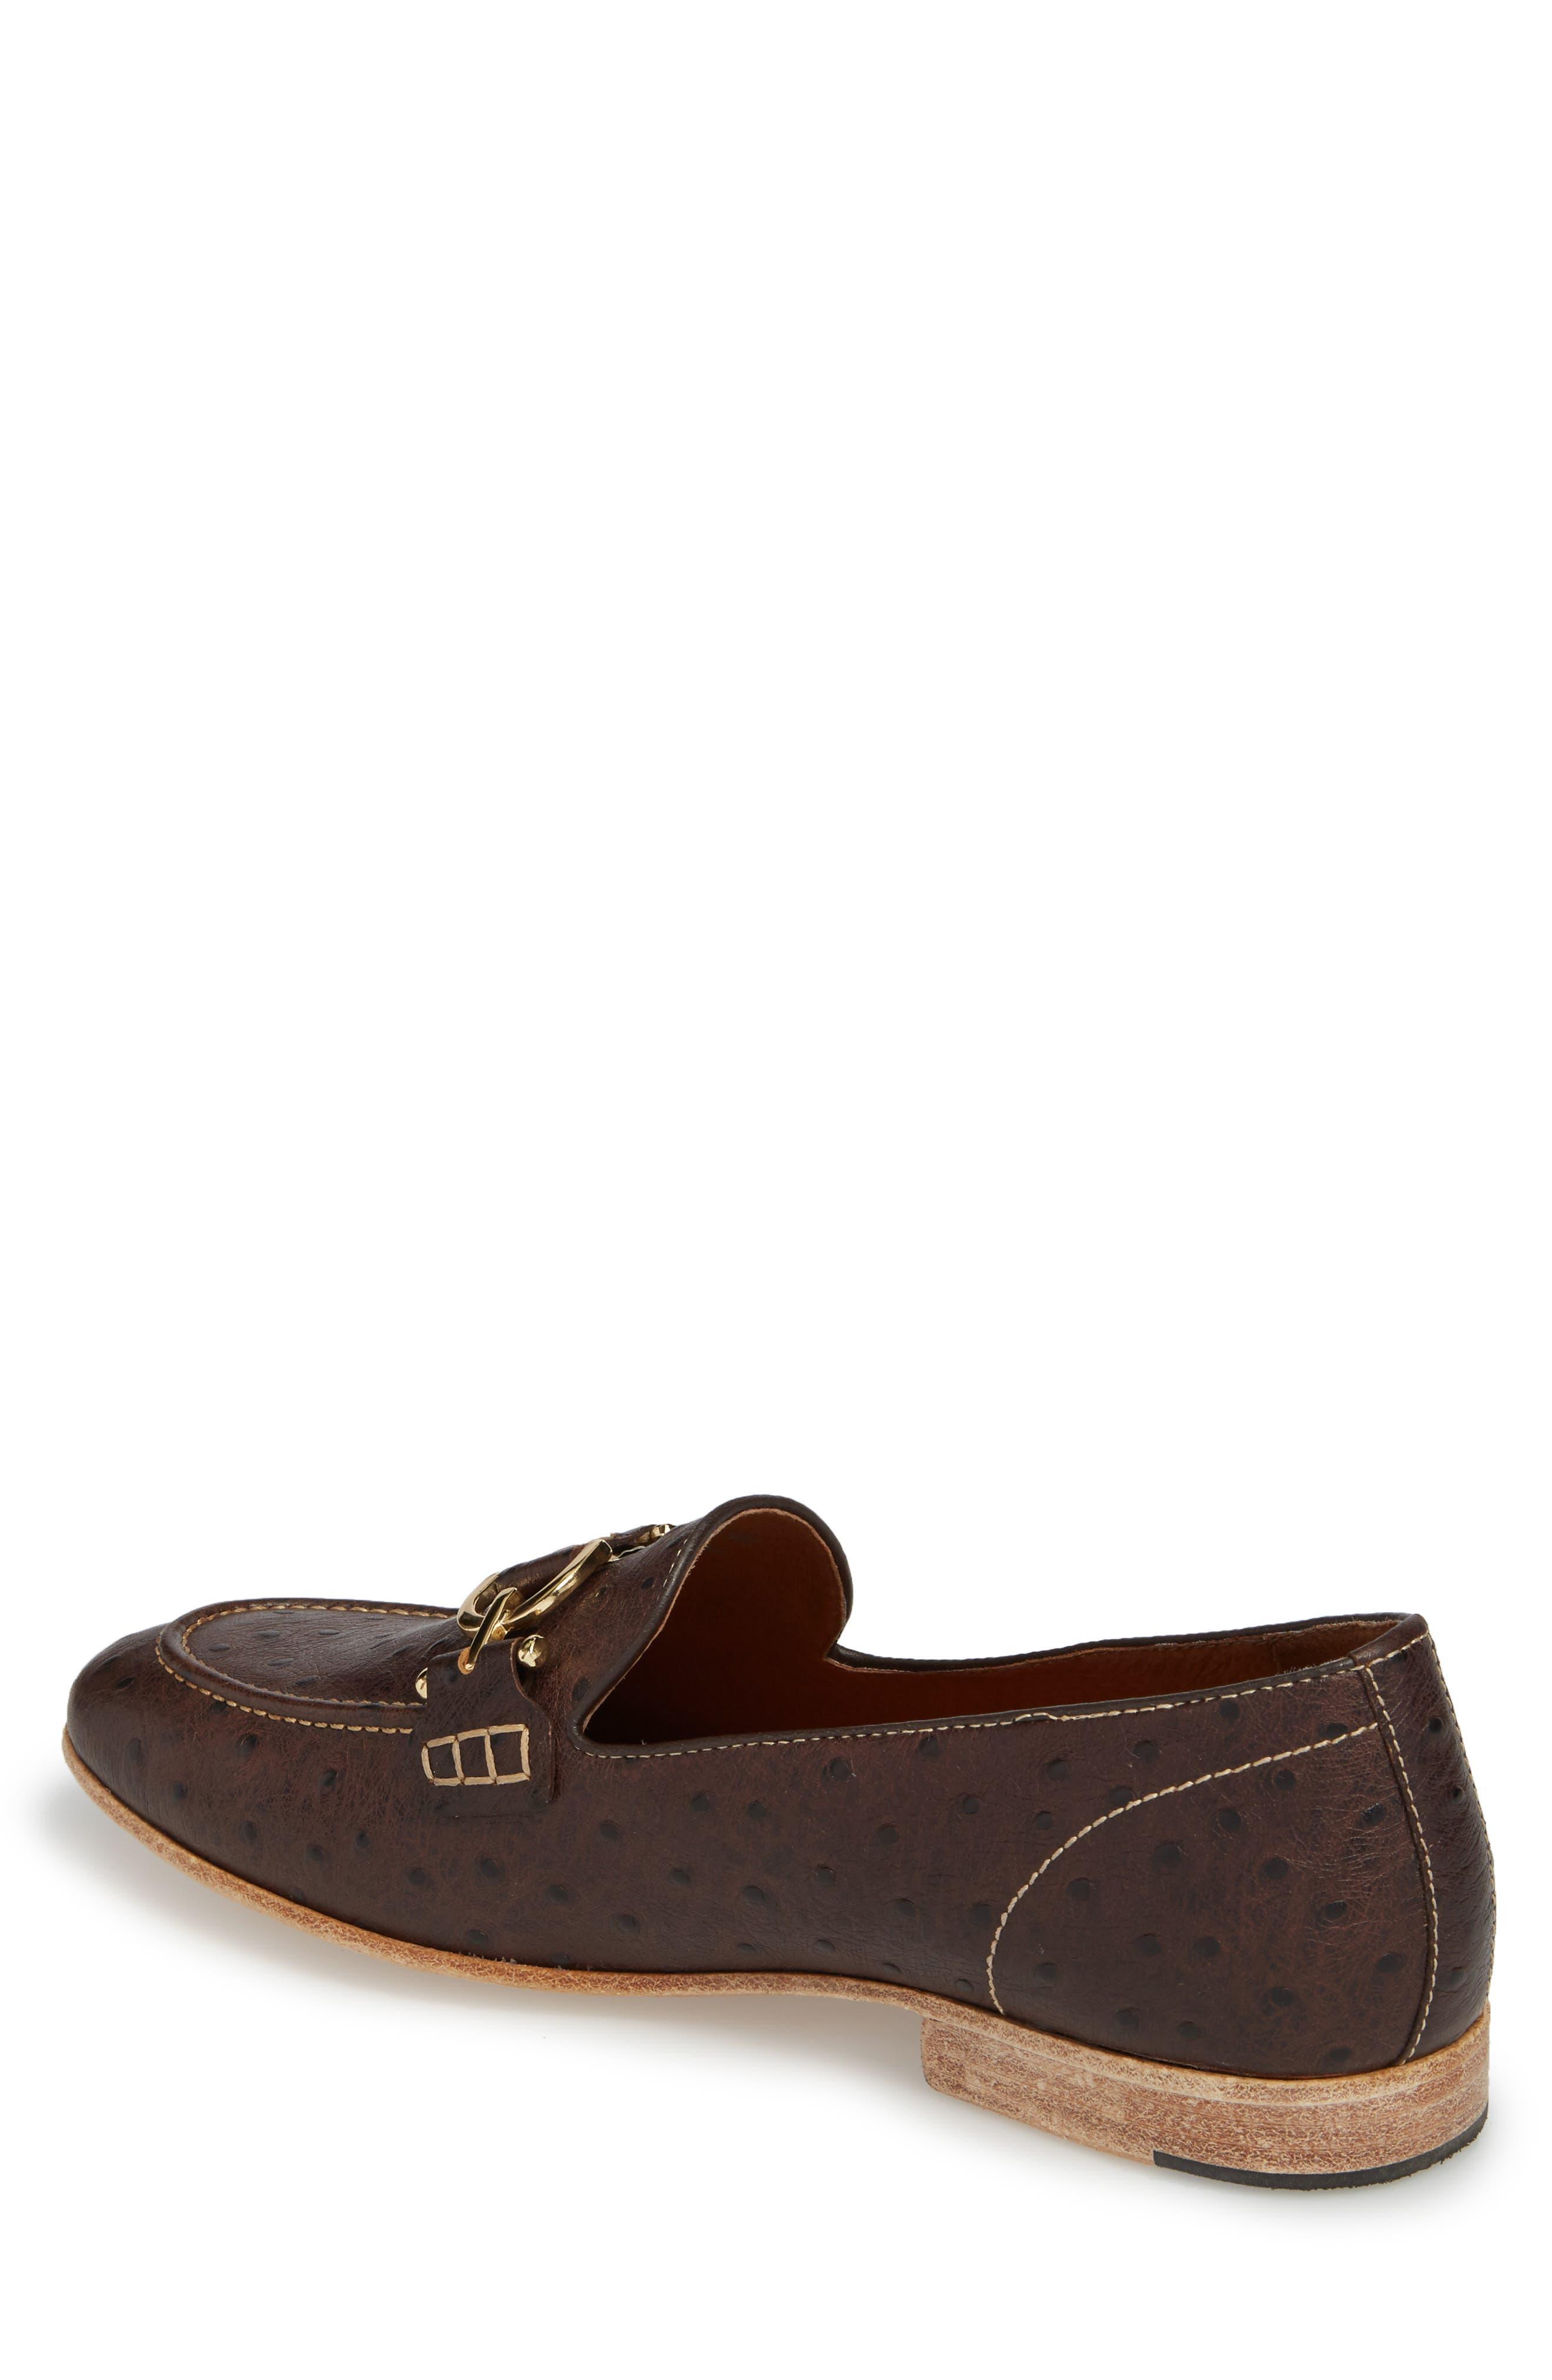 Moritz Apron Toe Bit Loafer,                             Alternate thumbnail 2, color,                             Brown Leather